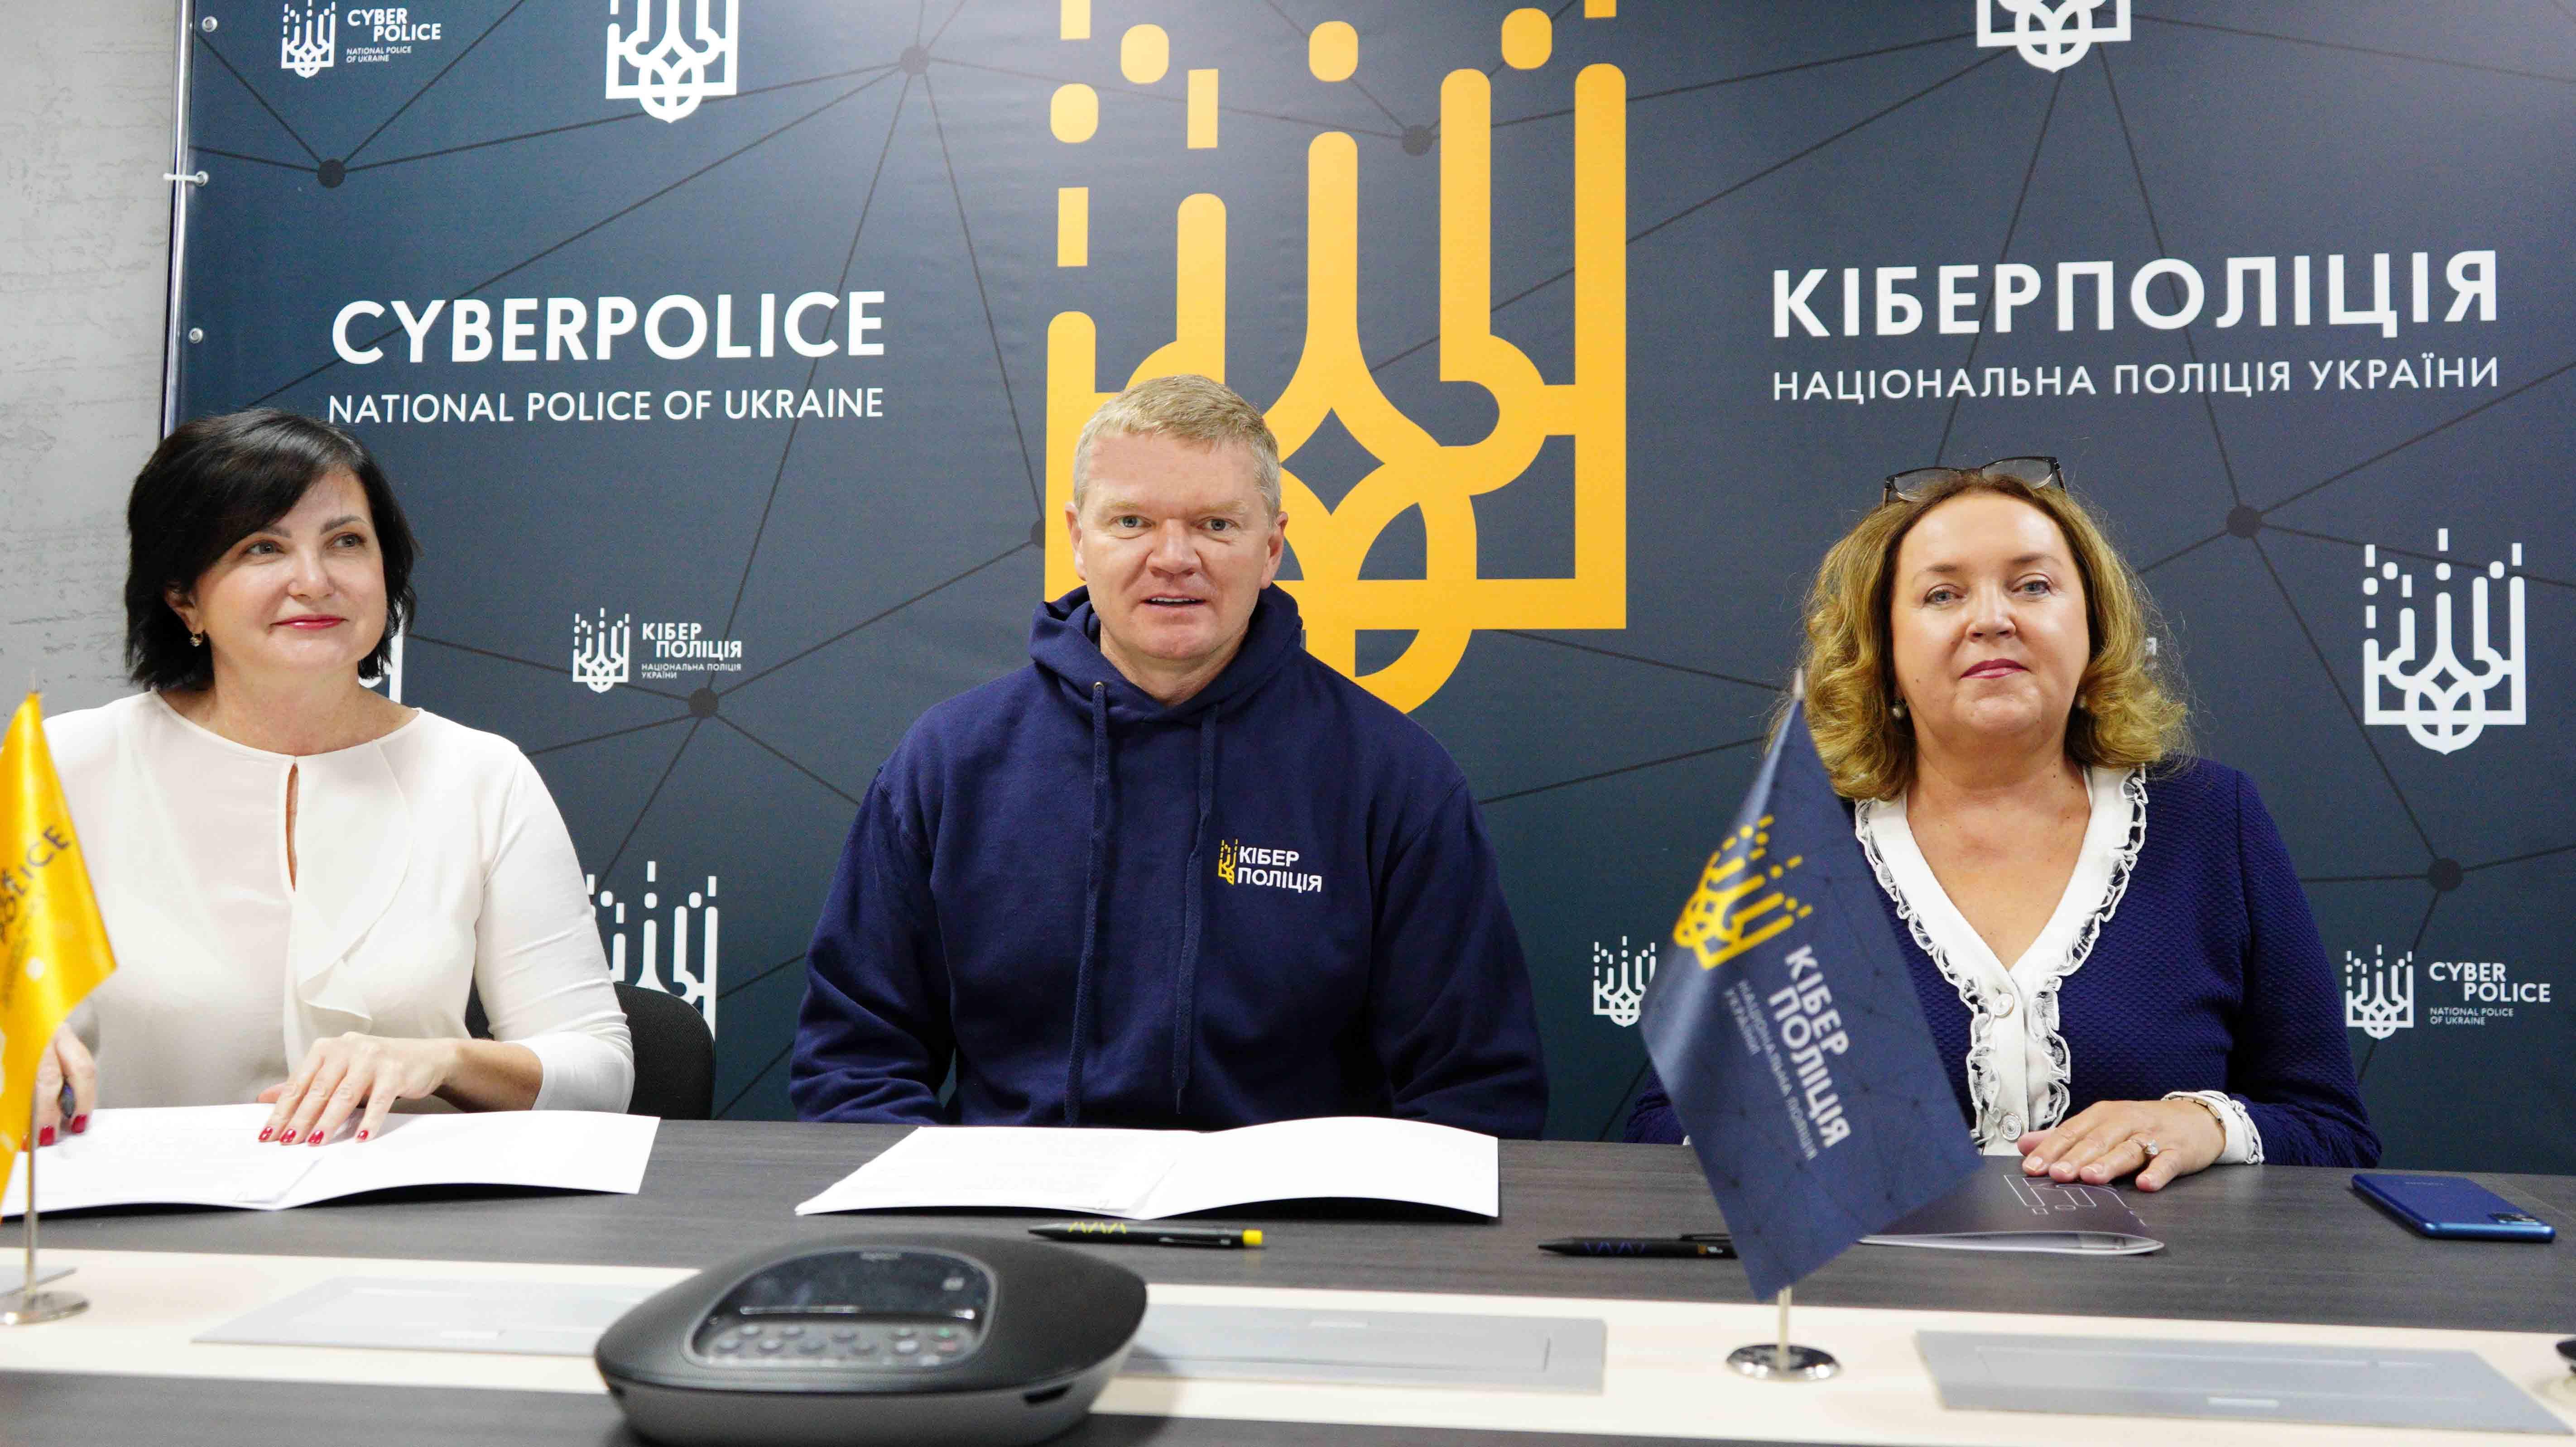 cyberpolice signed memorandum 2309211